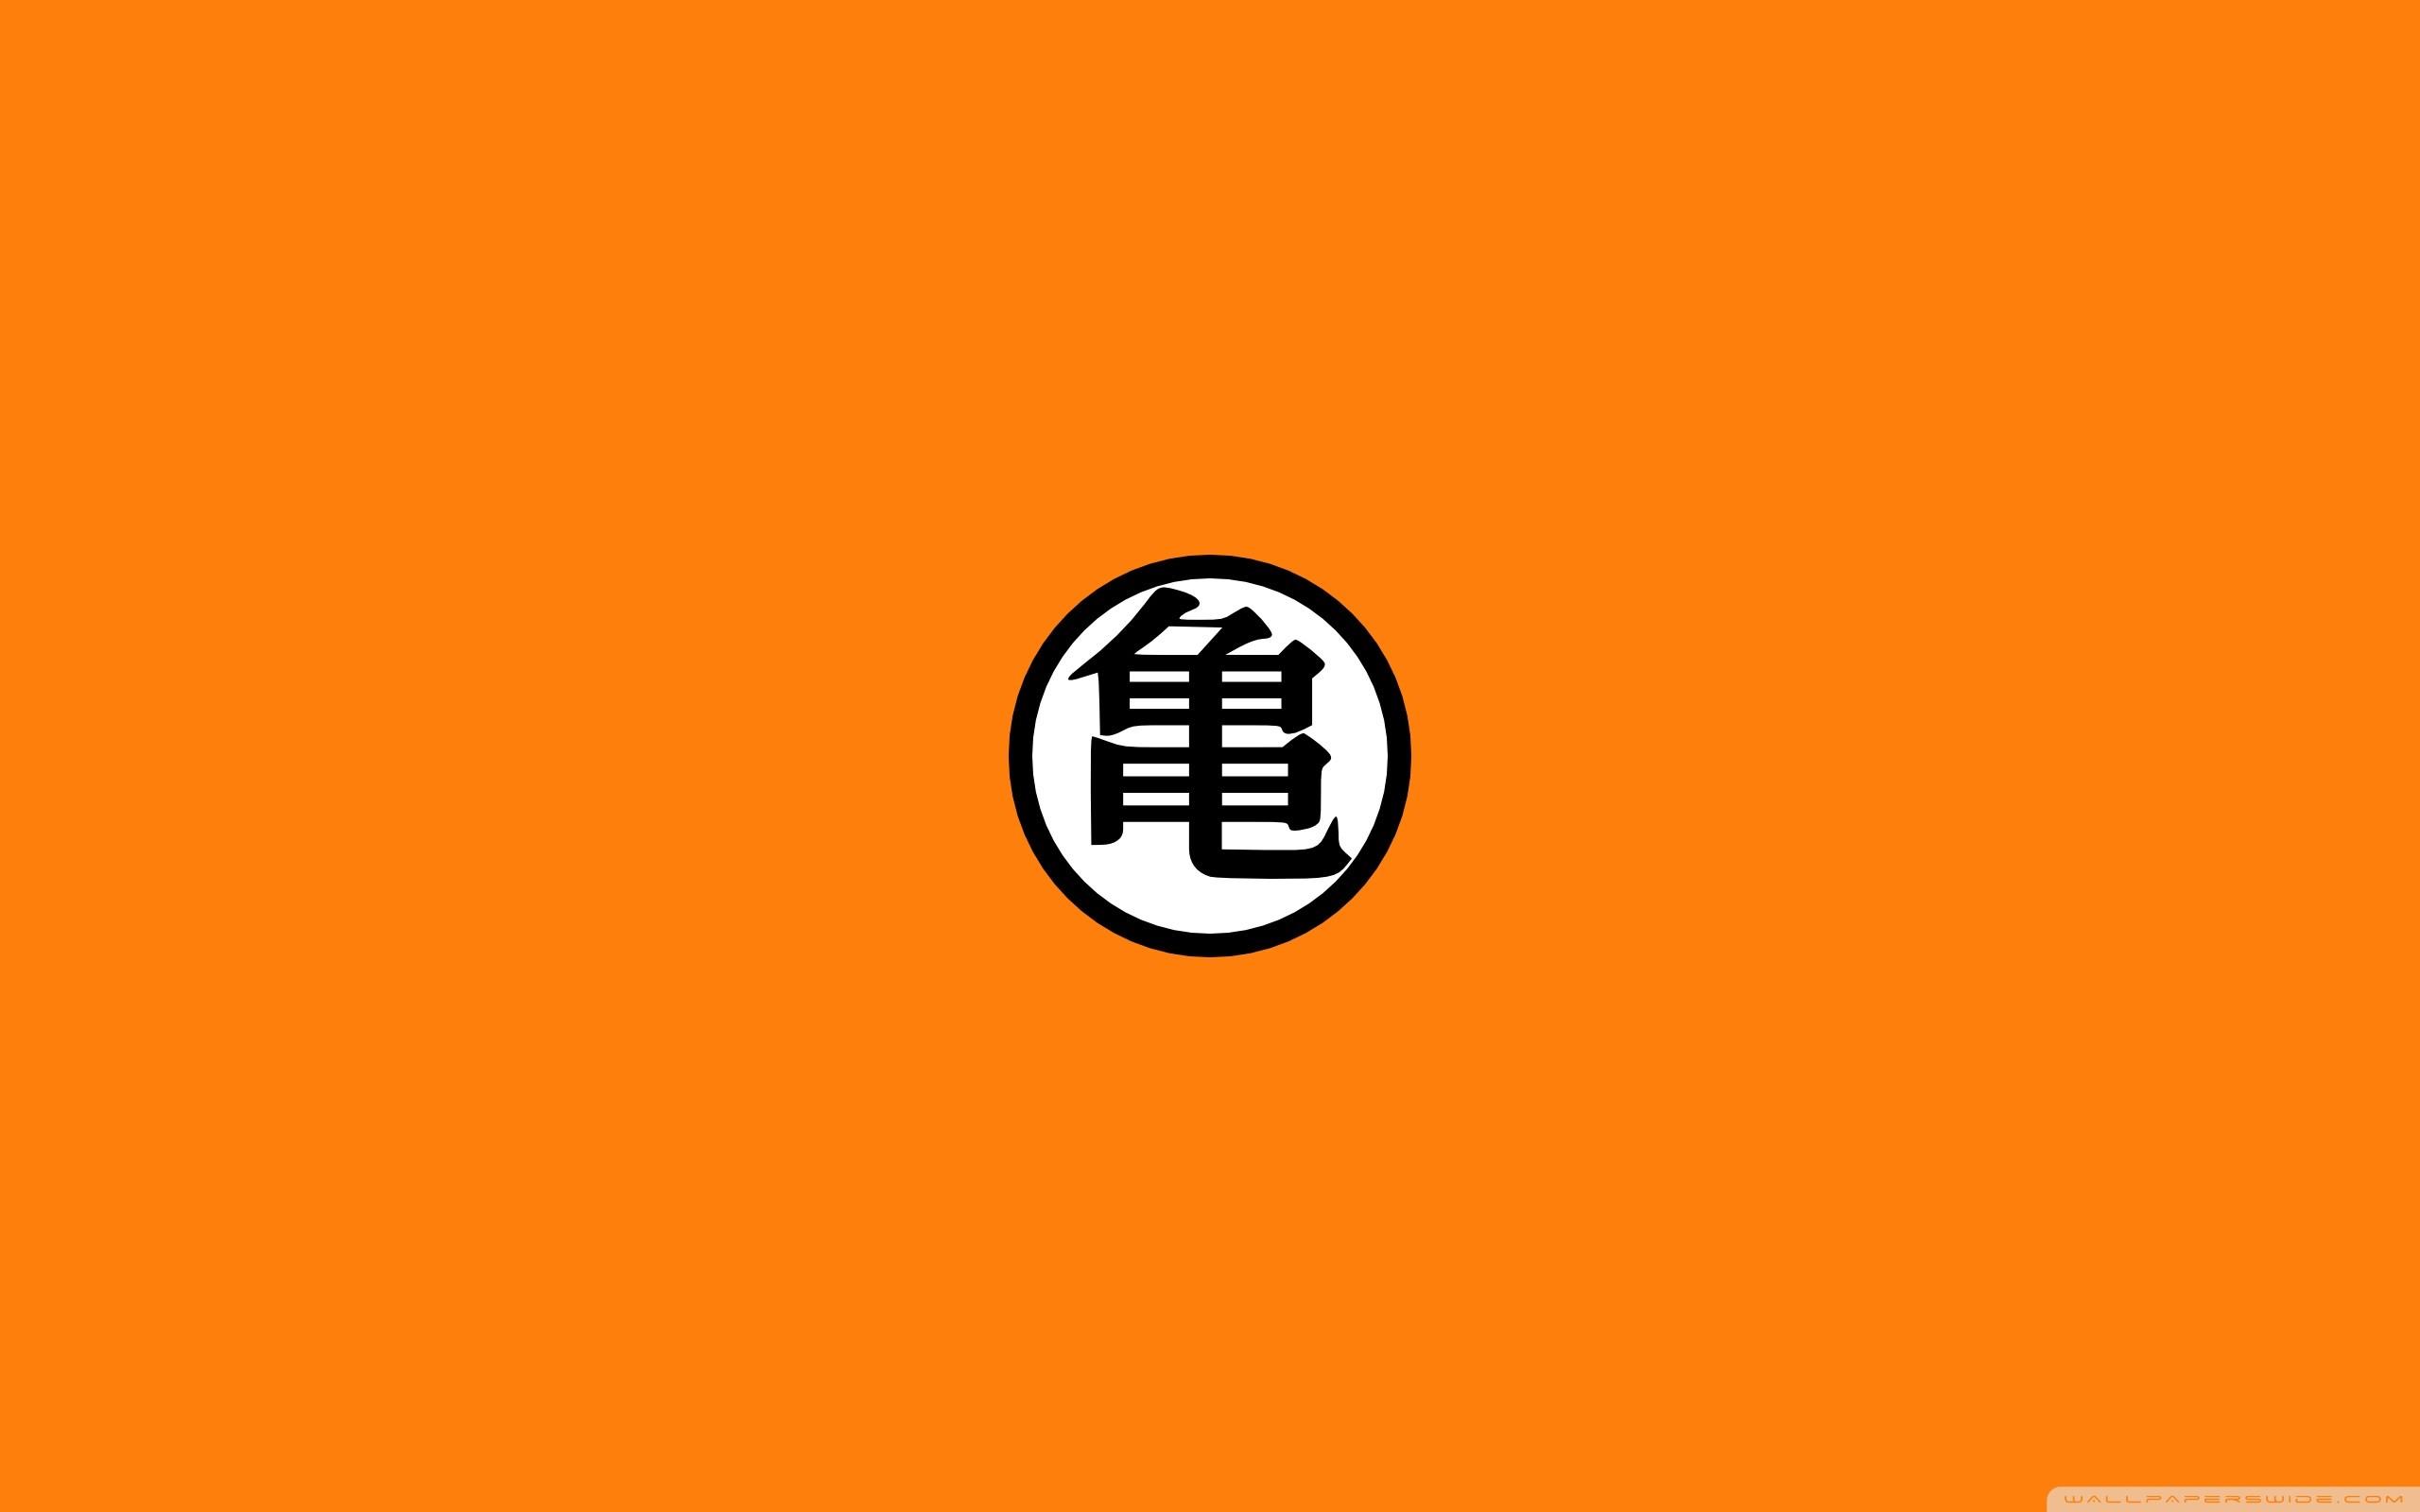 Dragon Ball Z HD Wide Wallpaper for Widescreen